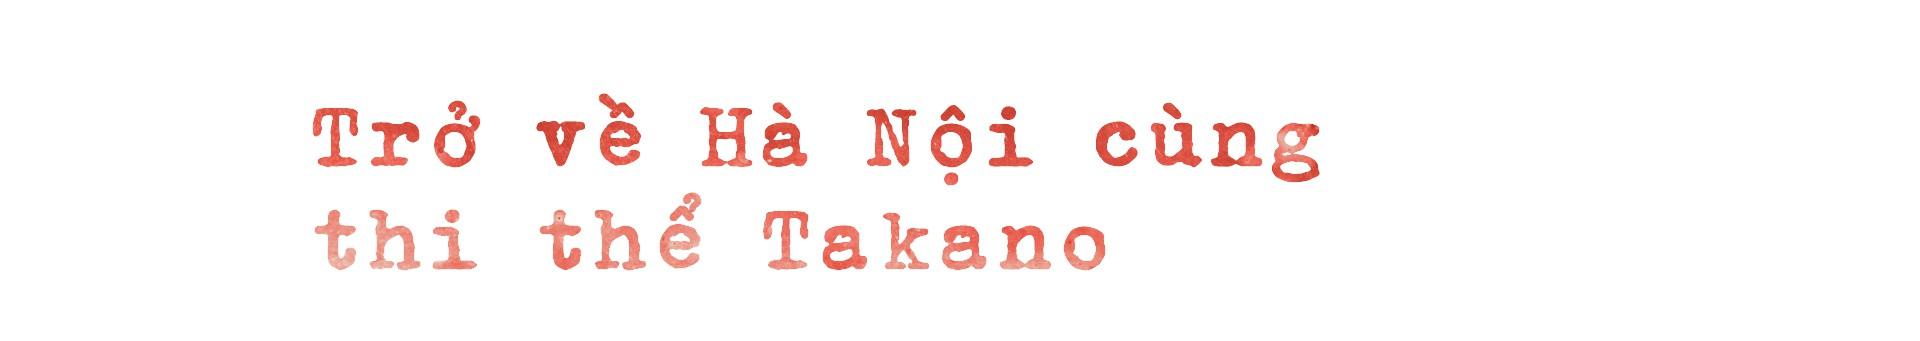 Kỳ 3: Cái chết của Takano - Ảnh 8.